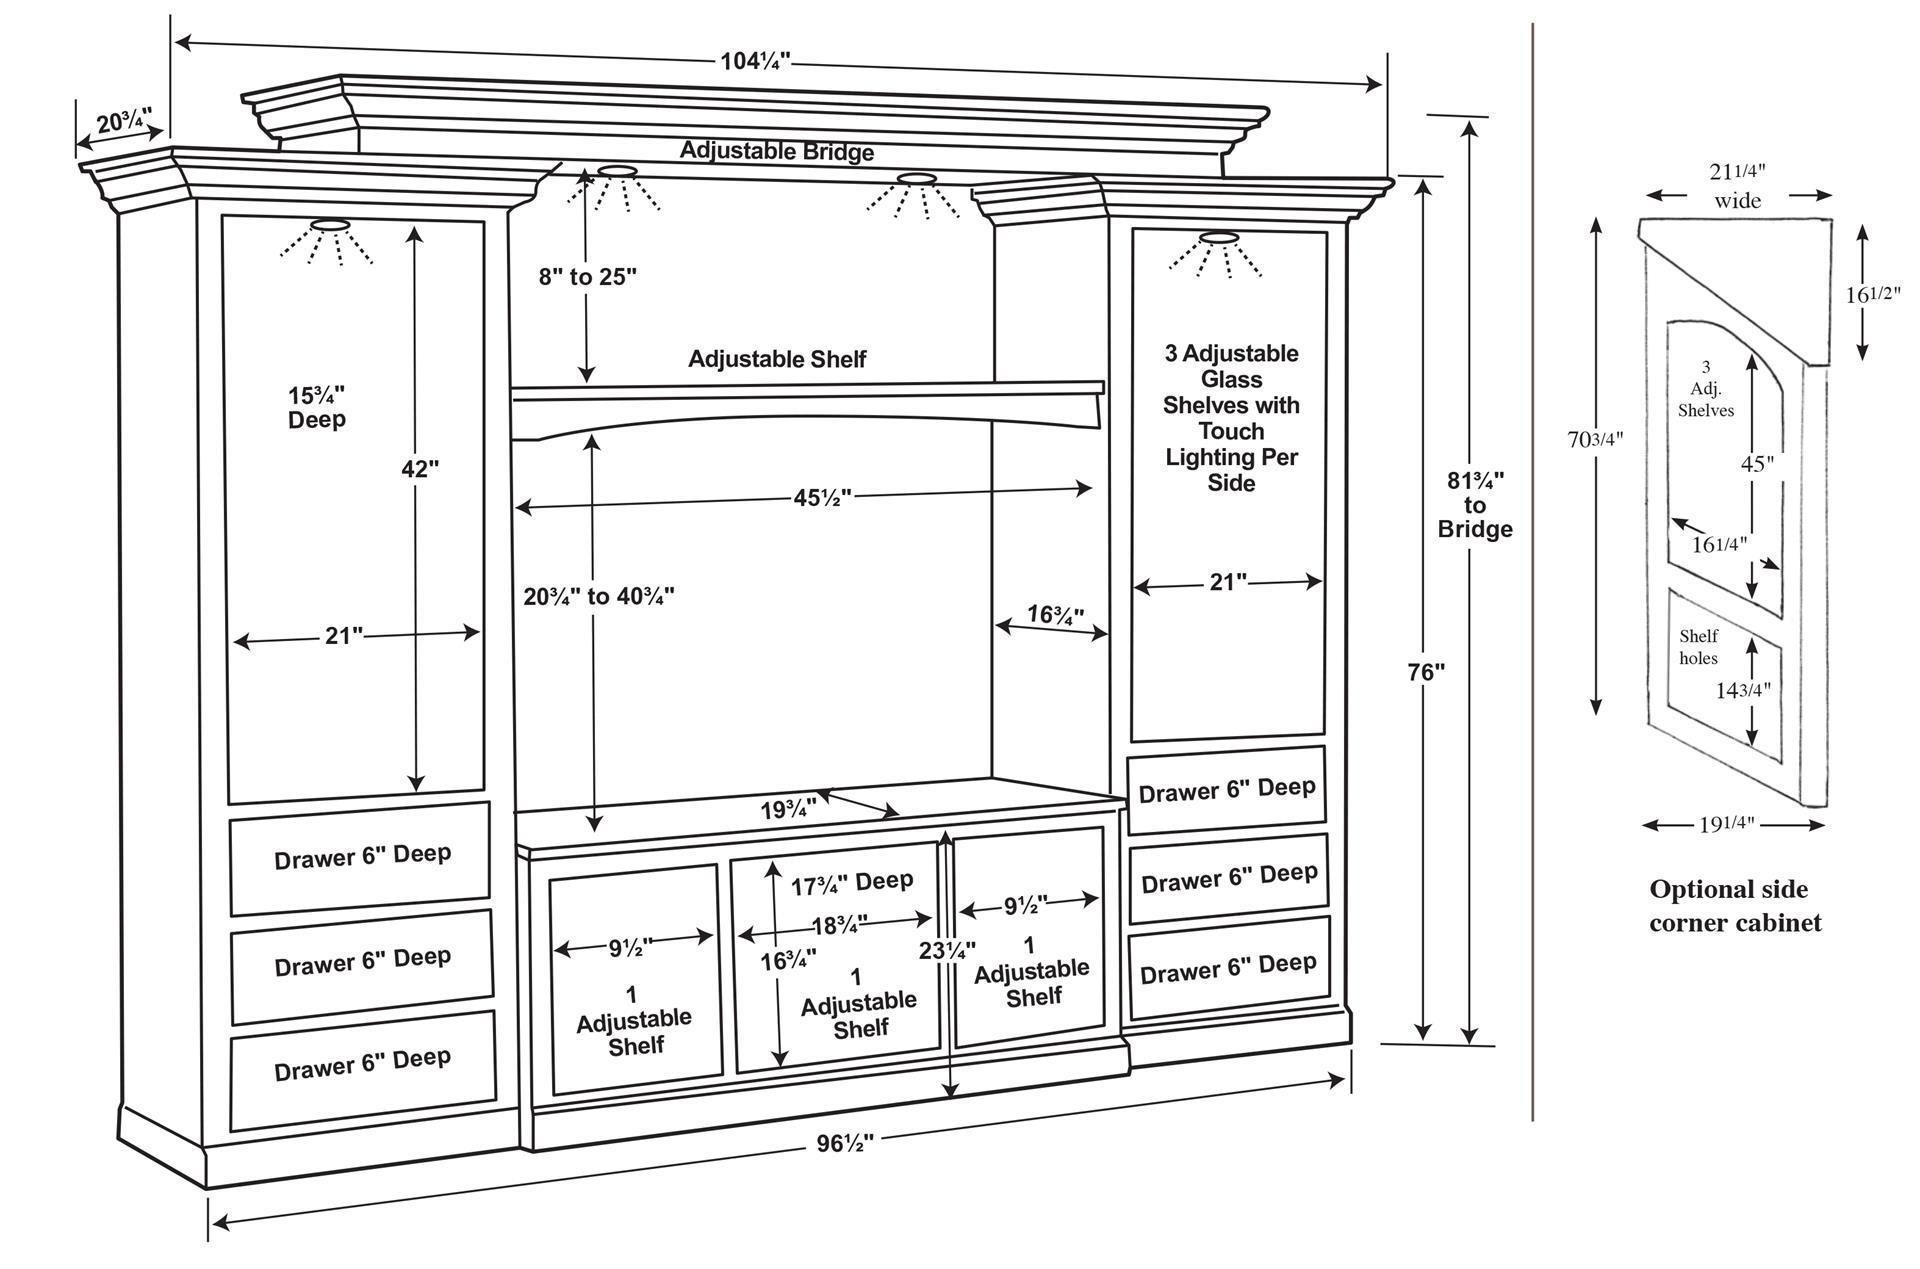 100 Doors Incredible Level 51 52 53 54 55 Guide Youtube